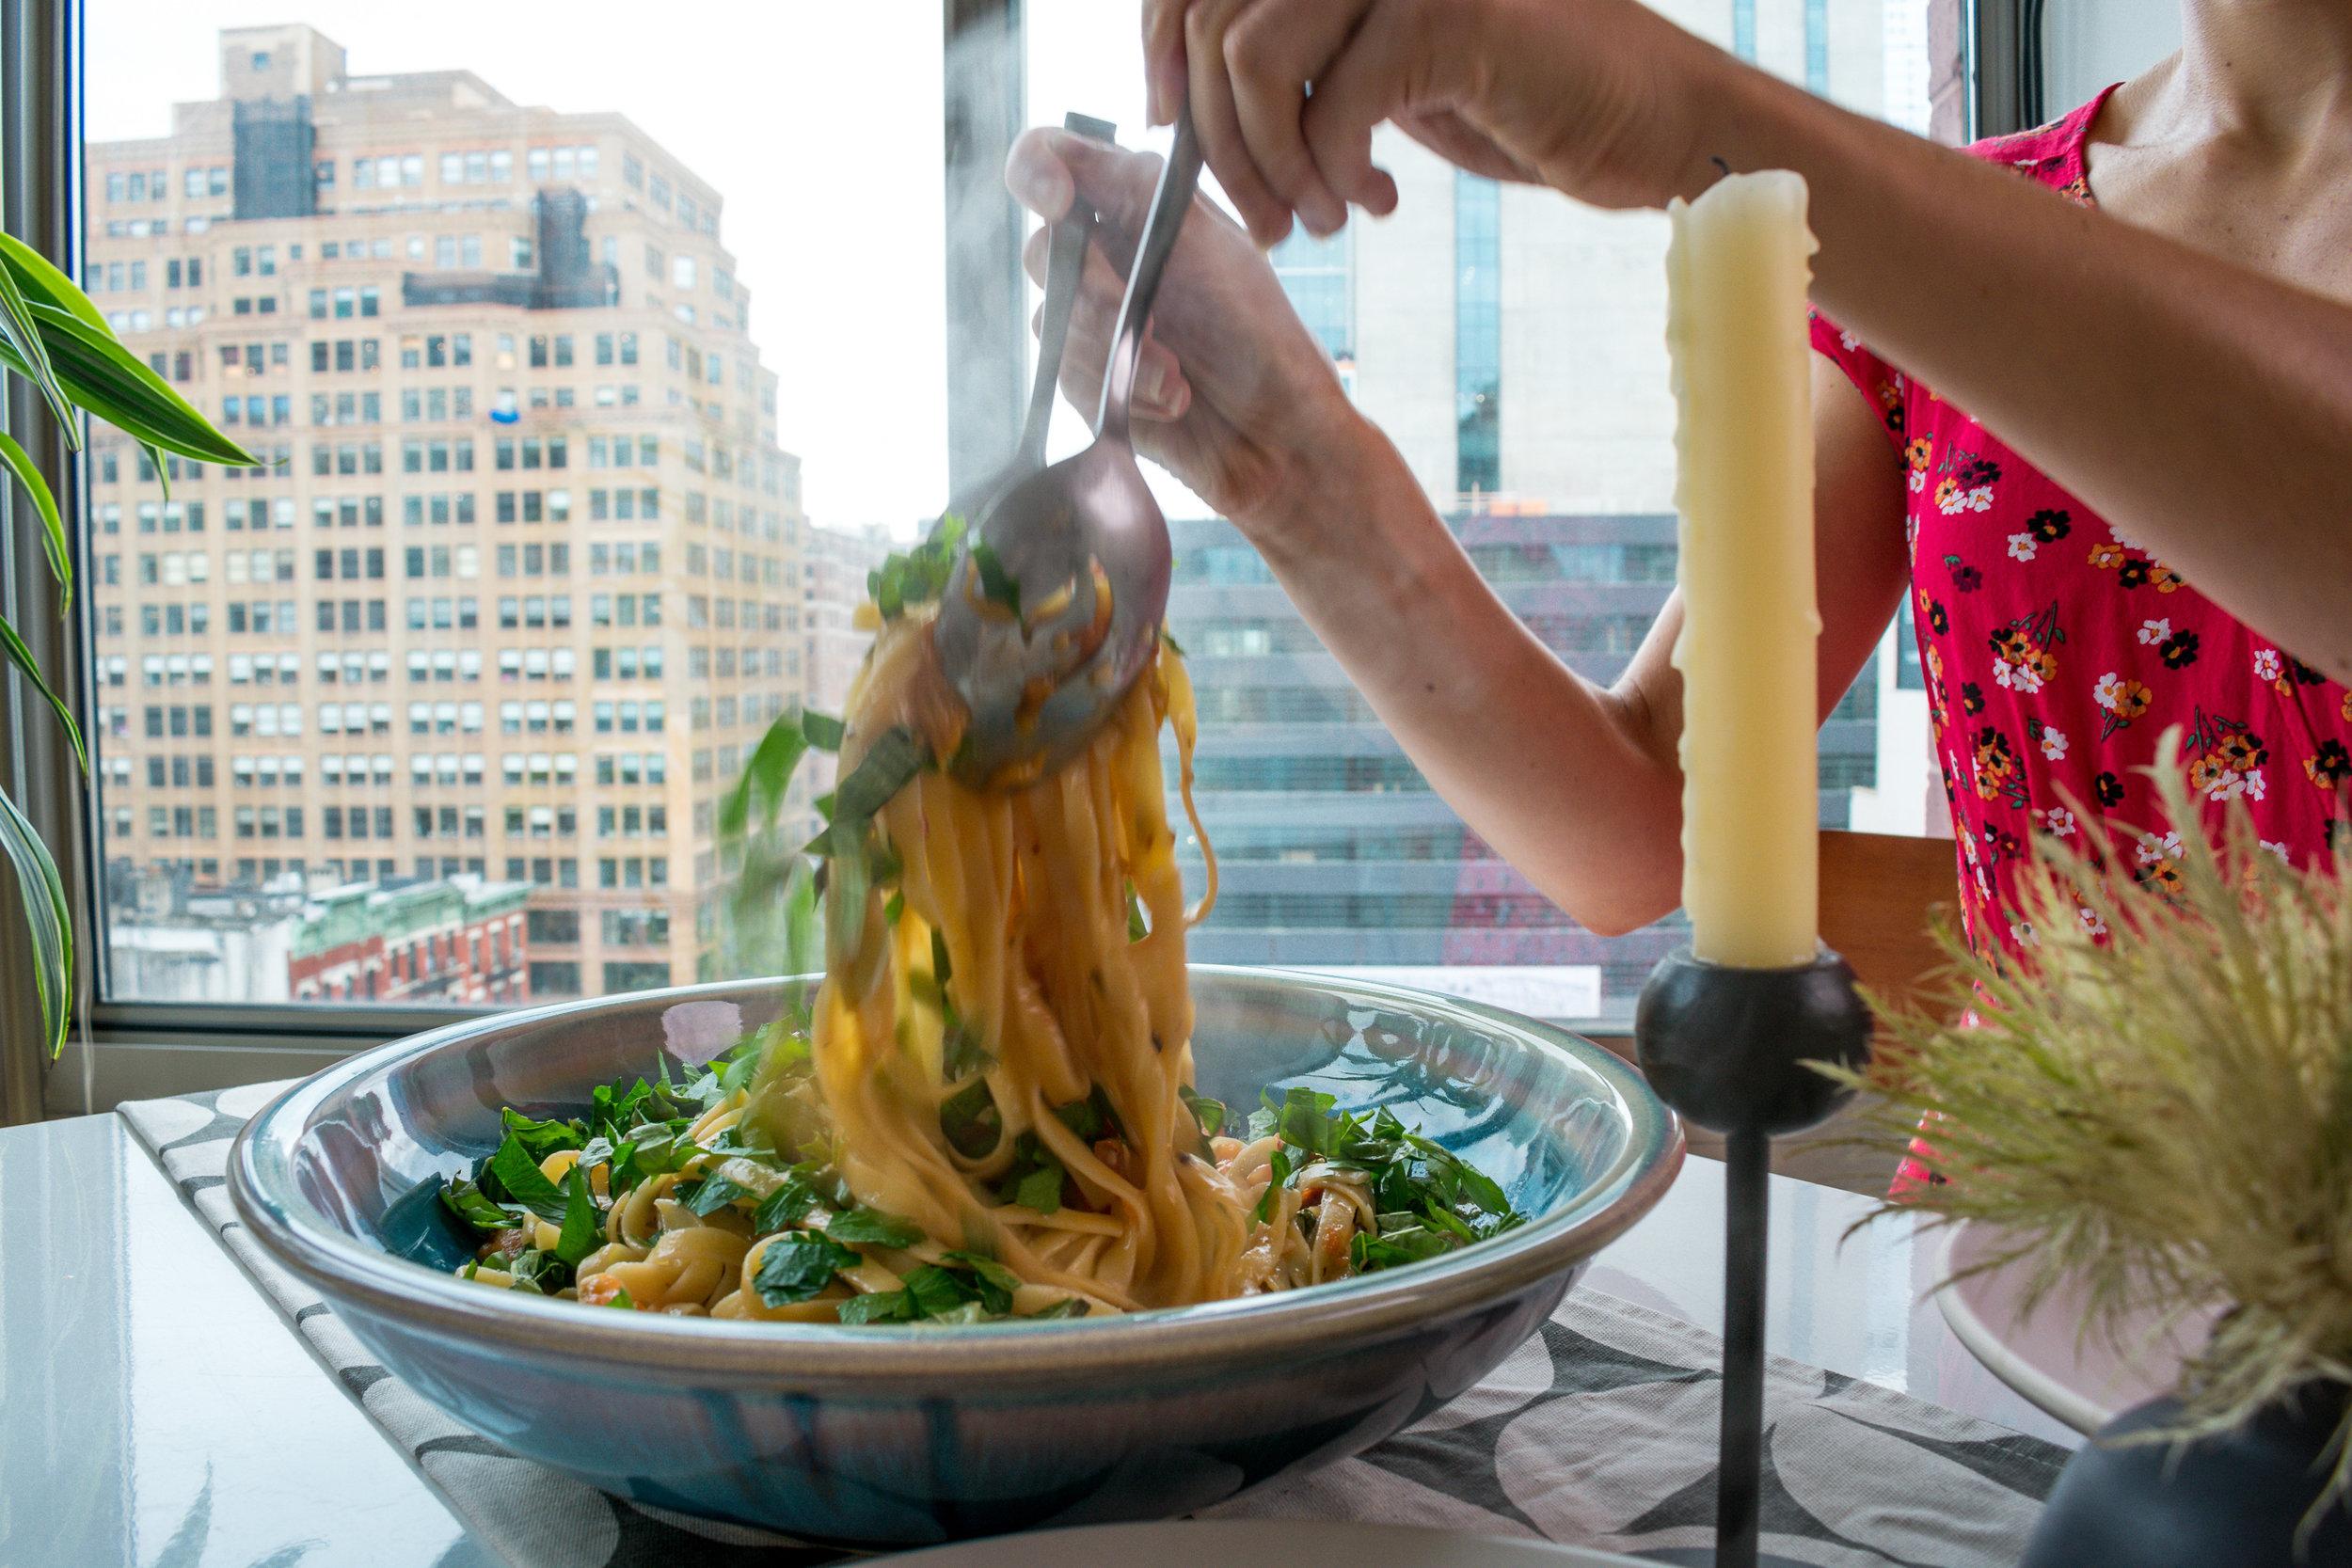 8 serving the pasta.jpg